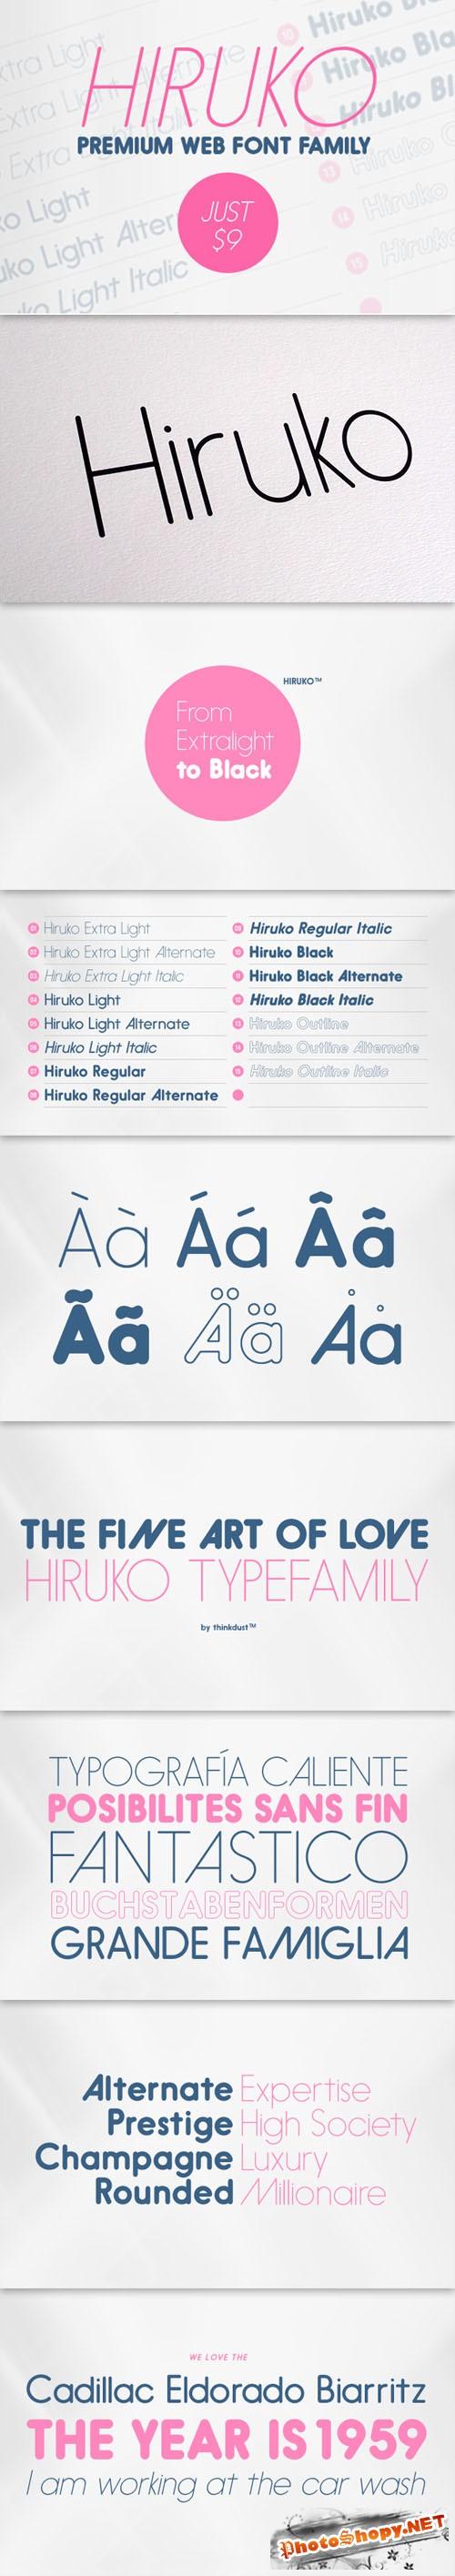 Hiruko Premium Web Font Family for Just $9 (regular $300)